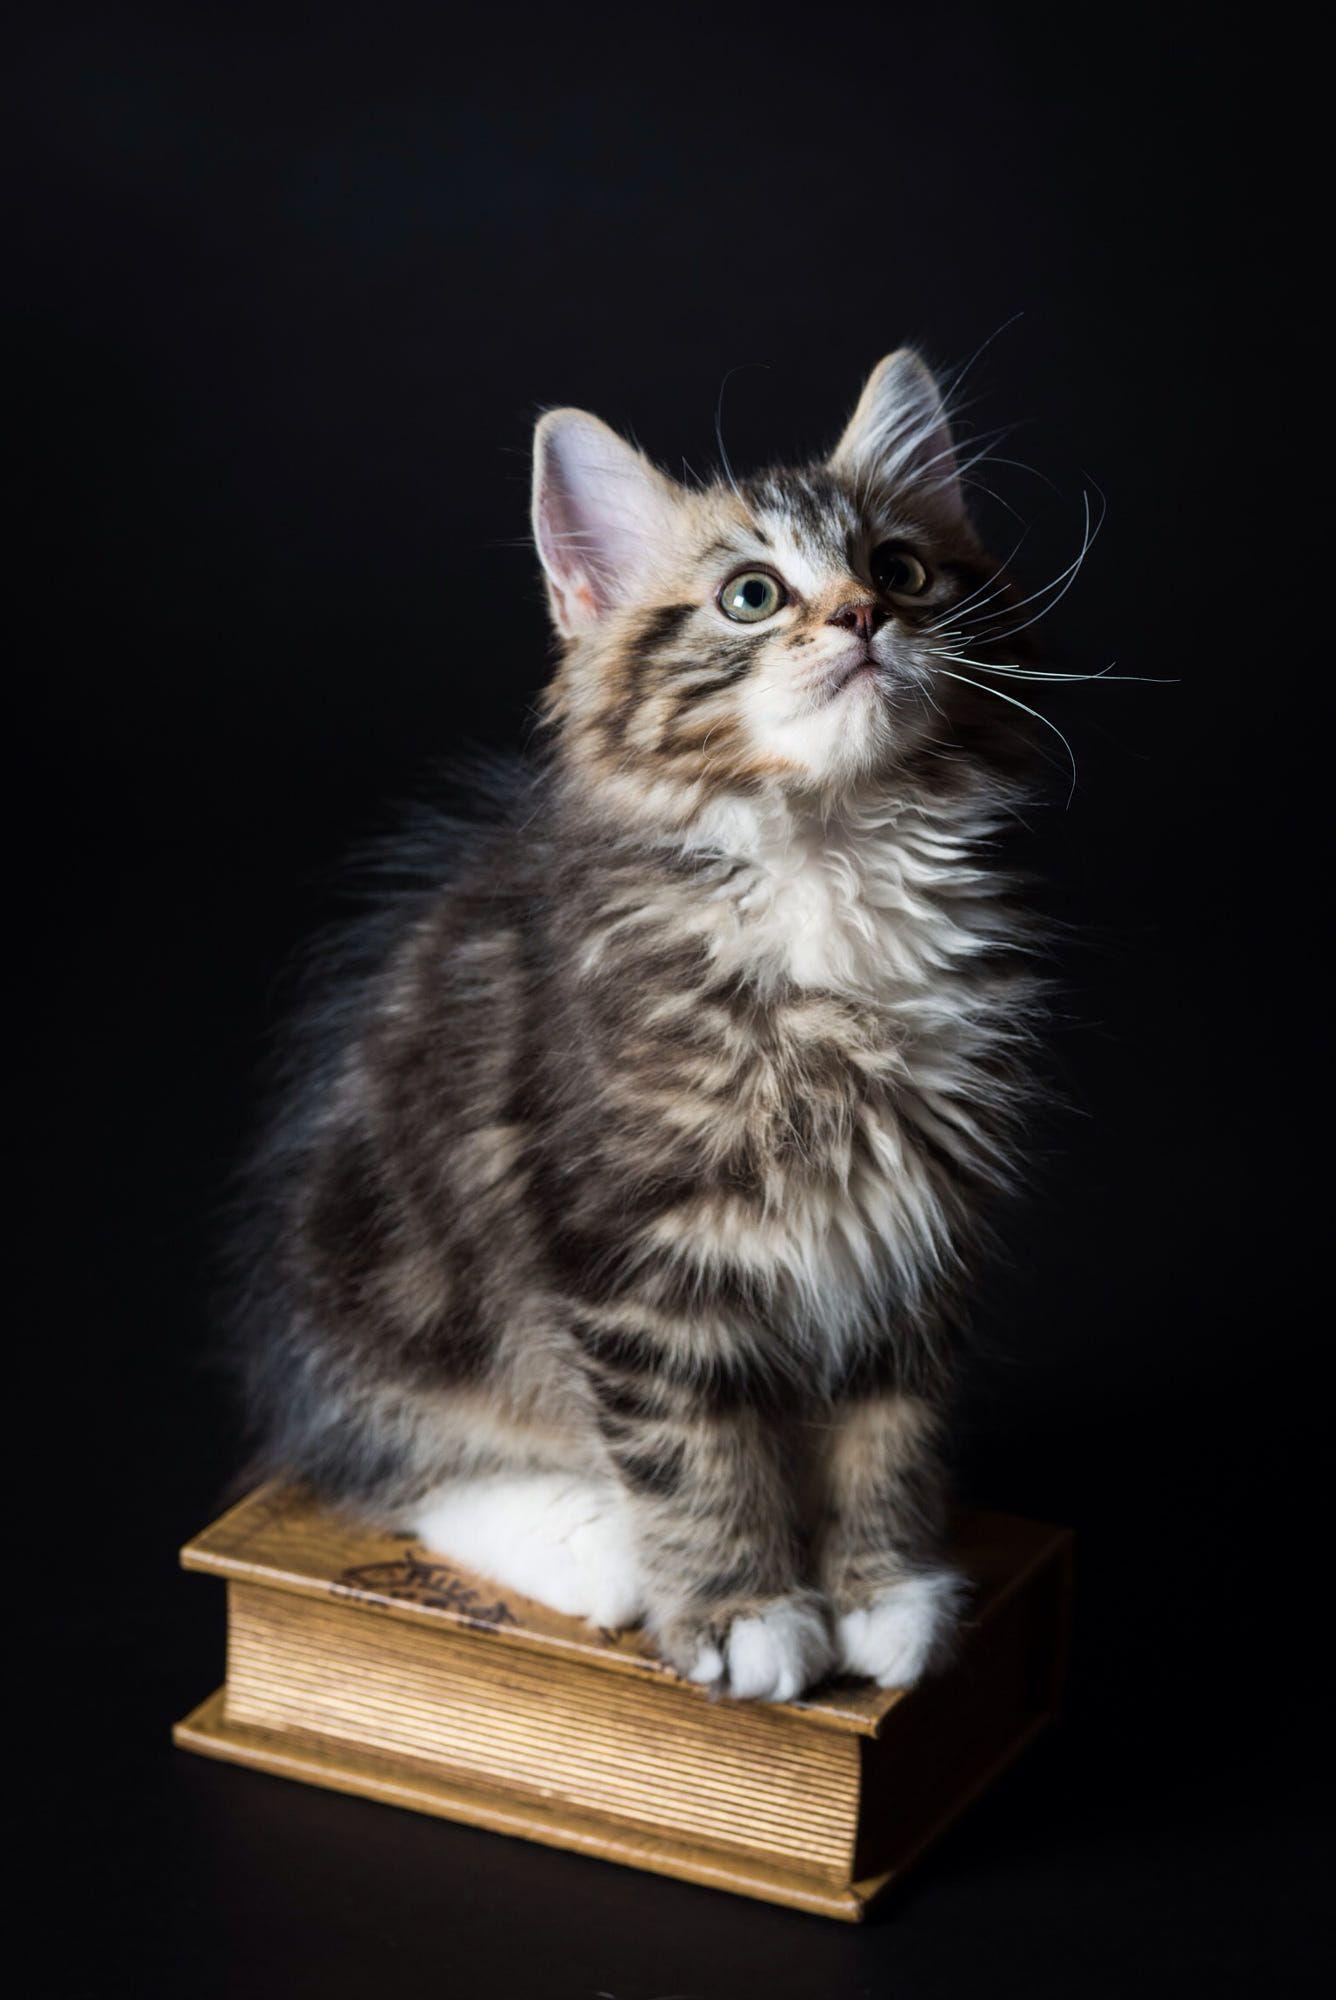 Cat by Ryuichi Miyazaki Cats, Pretty cats, Cute cats